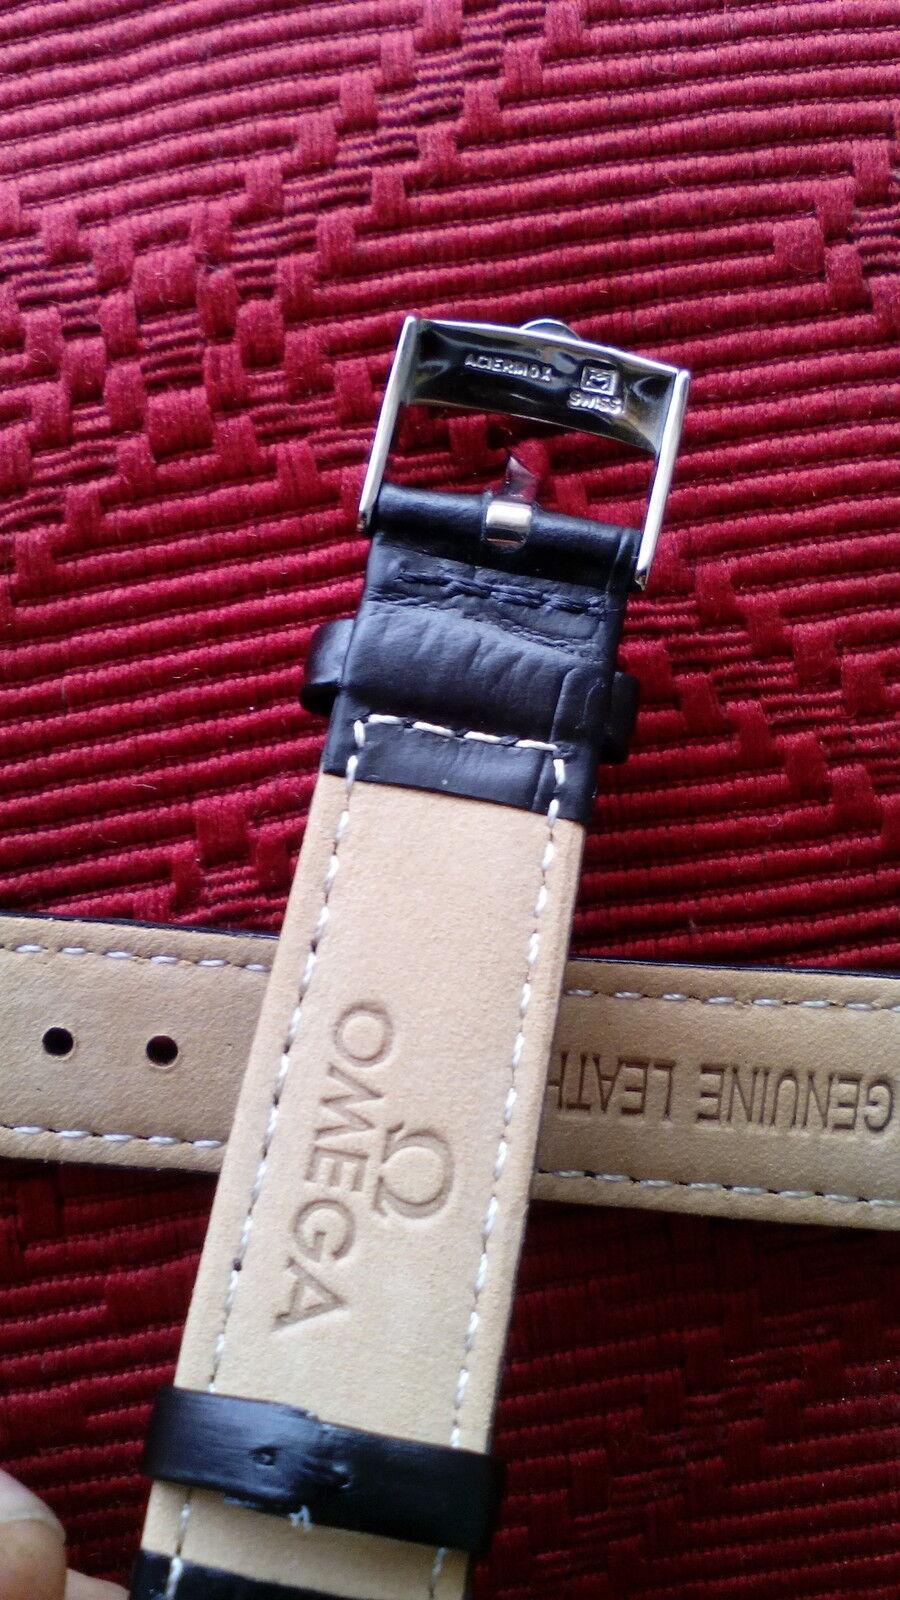 cinturino in vera pelle nera, marcato Omega swiss made, ansa 18mm, fibbia silver